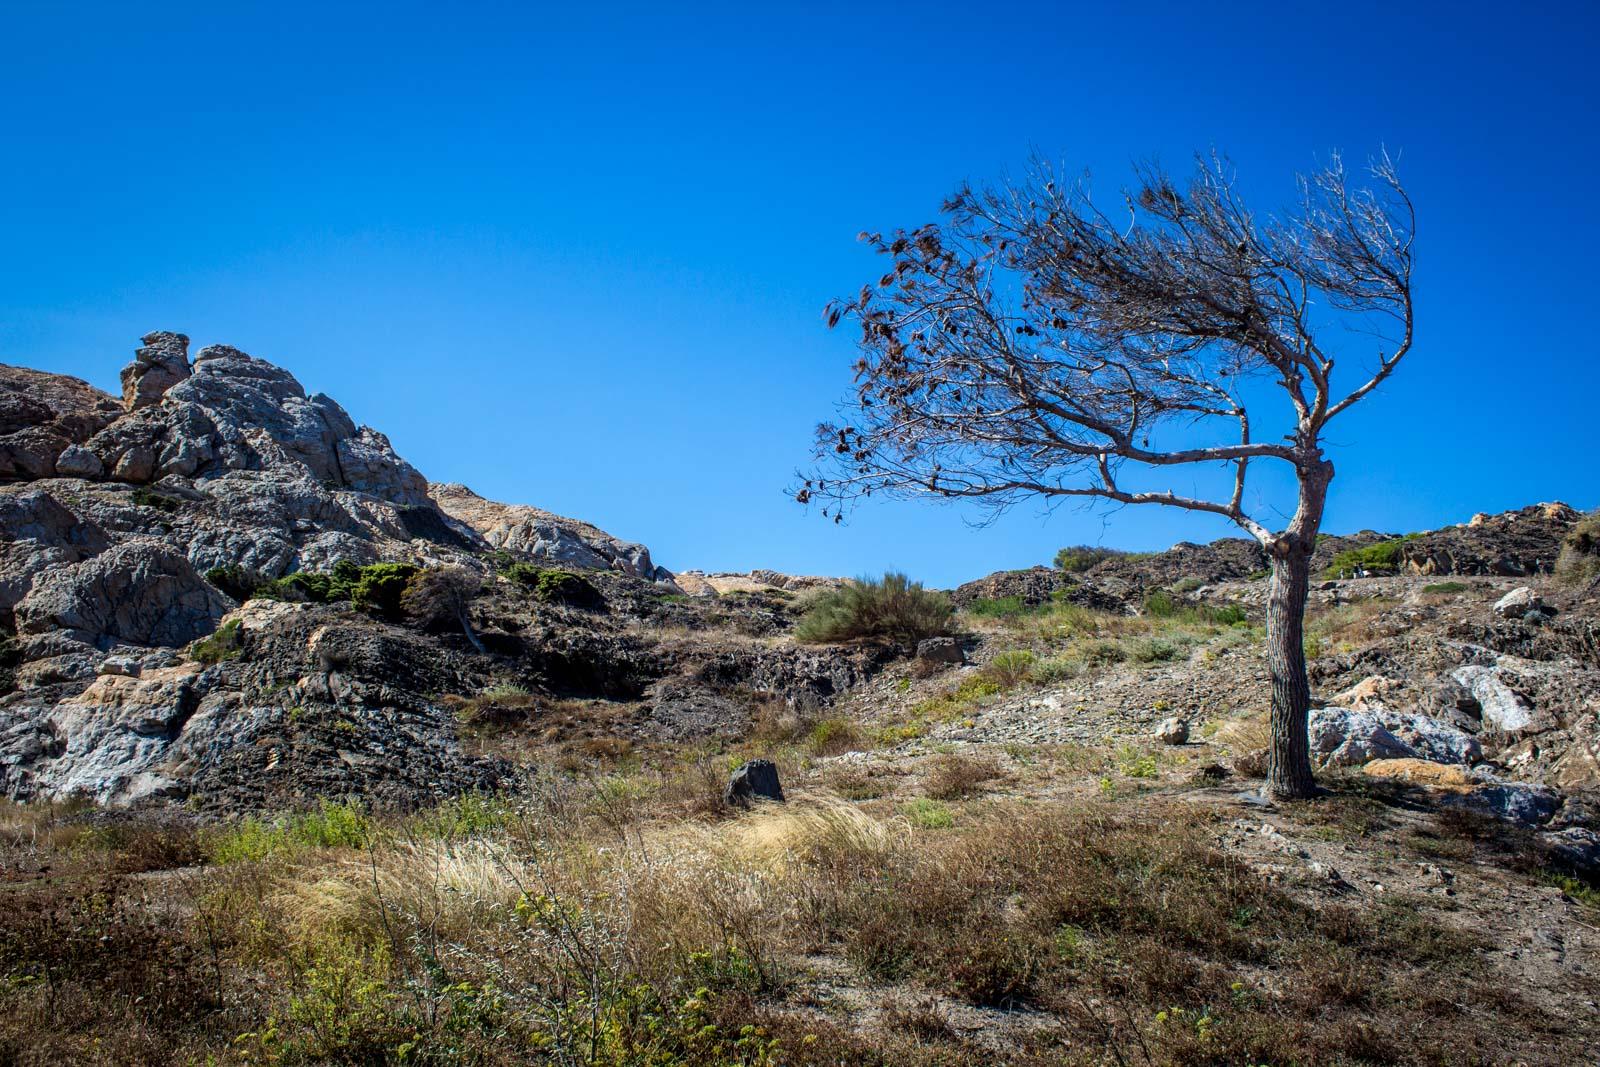 cap de creus, natural park, catalonia, spain, salvador dali inspiration